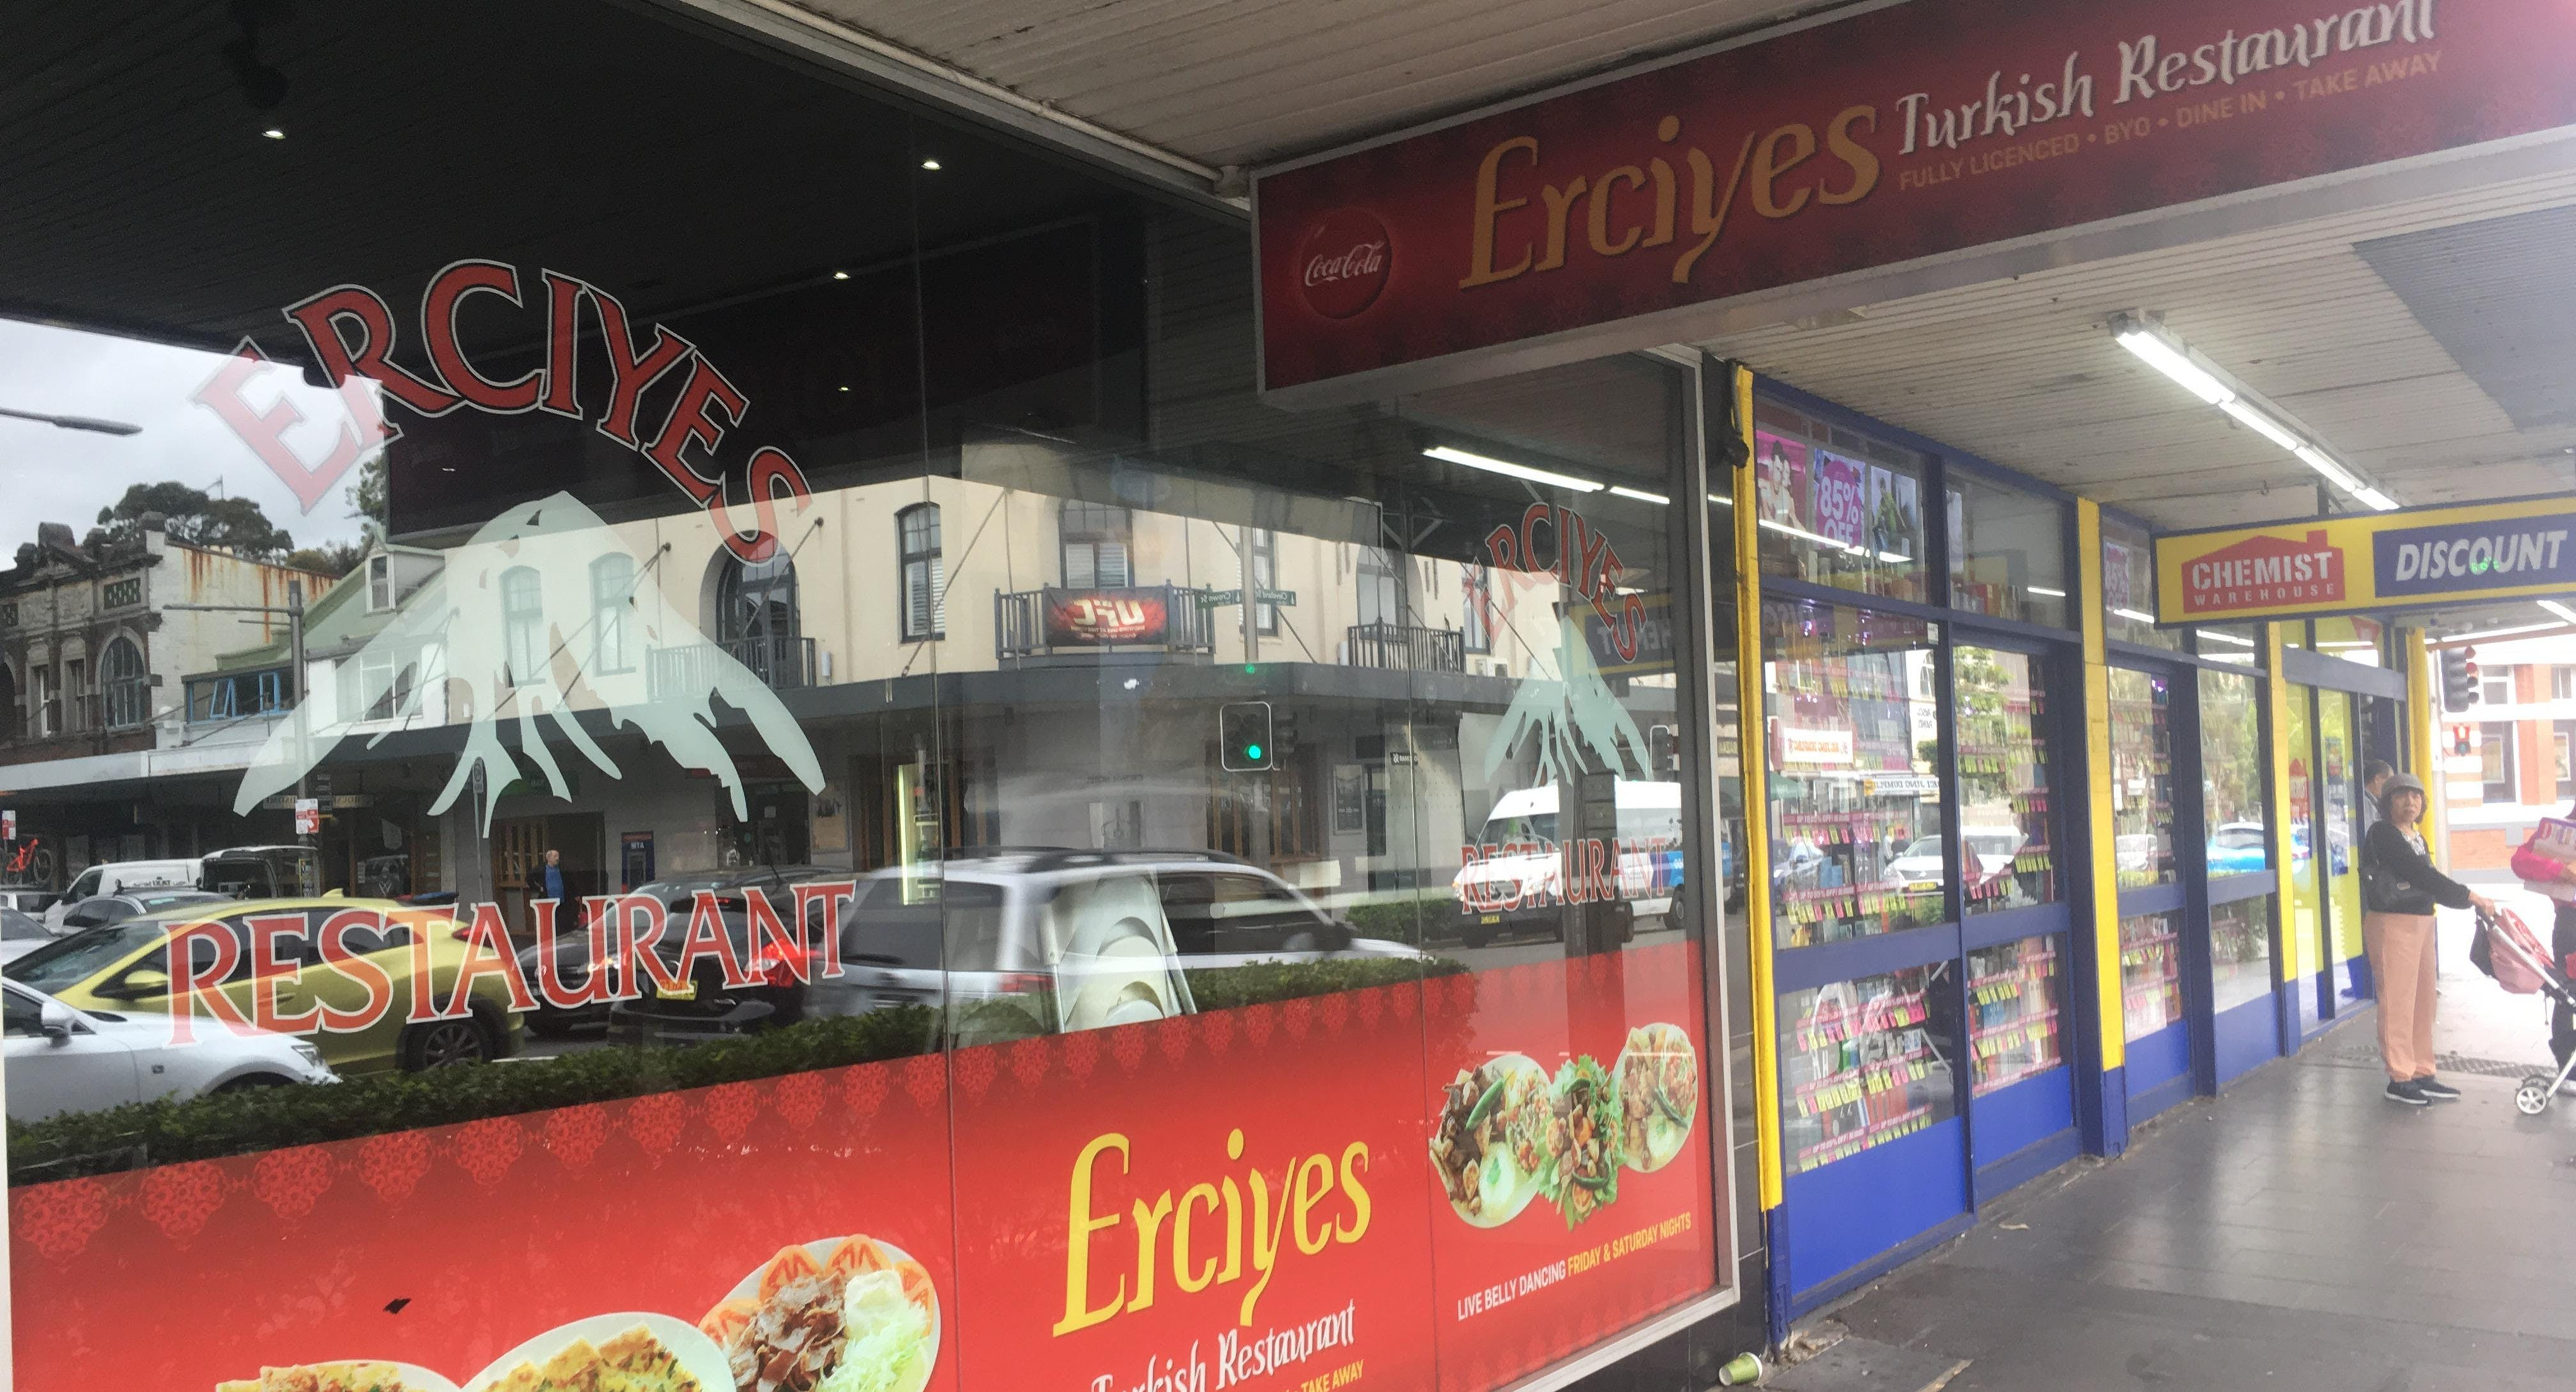 Erciyes Restaurant Sydney image 2